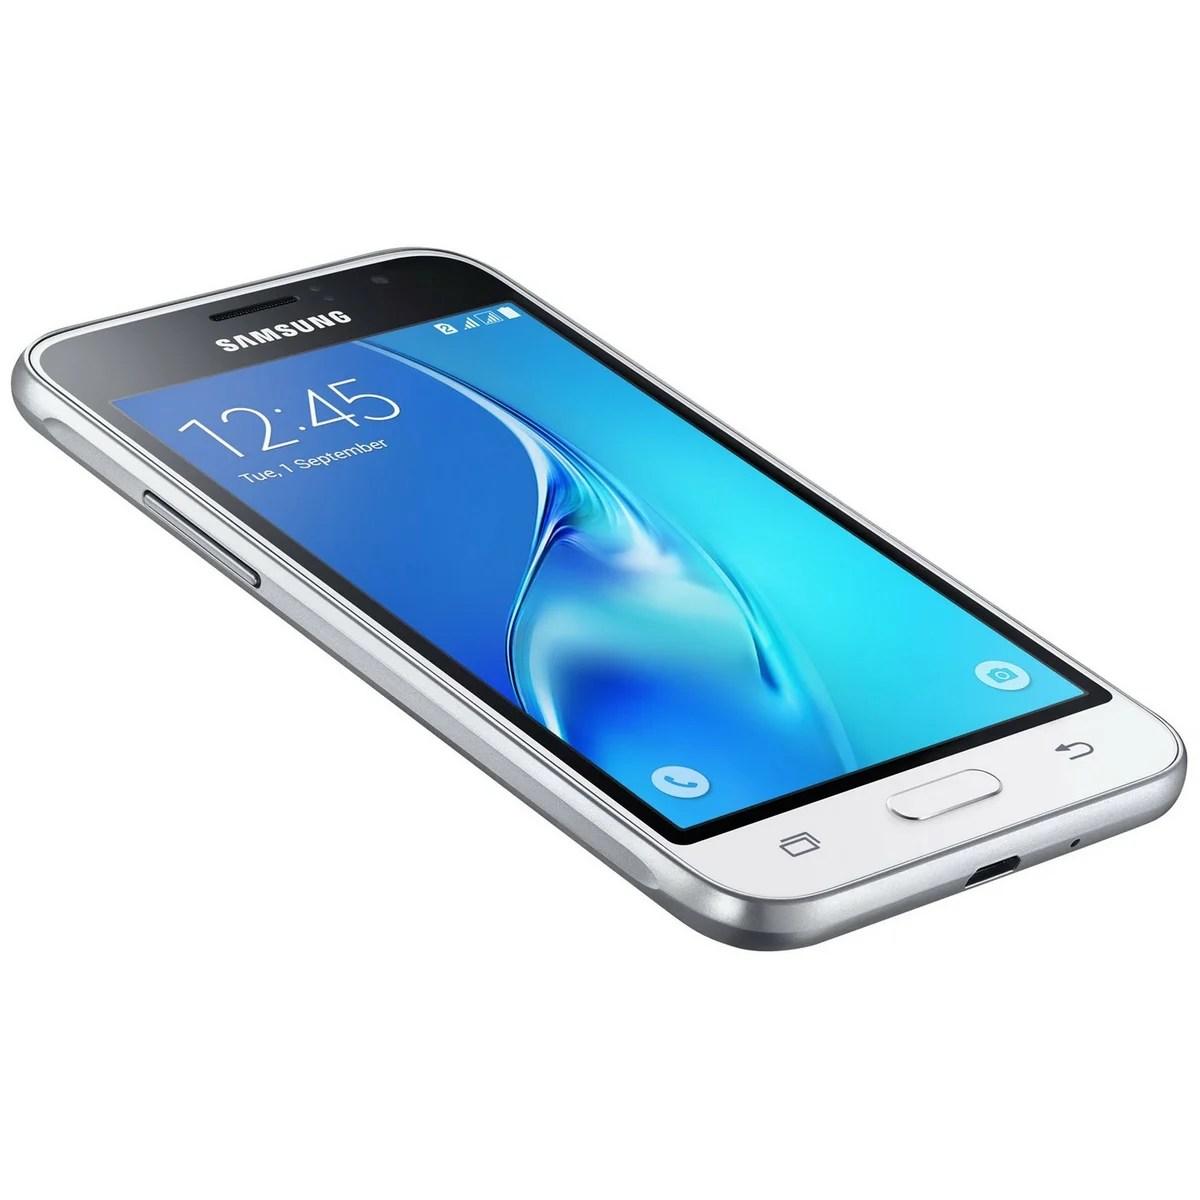 samsung galaxy smartphone - 1000×1000